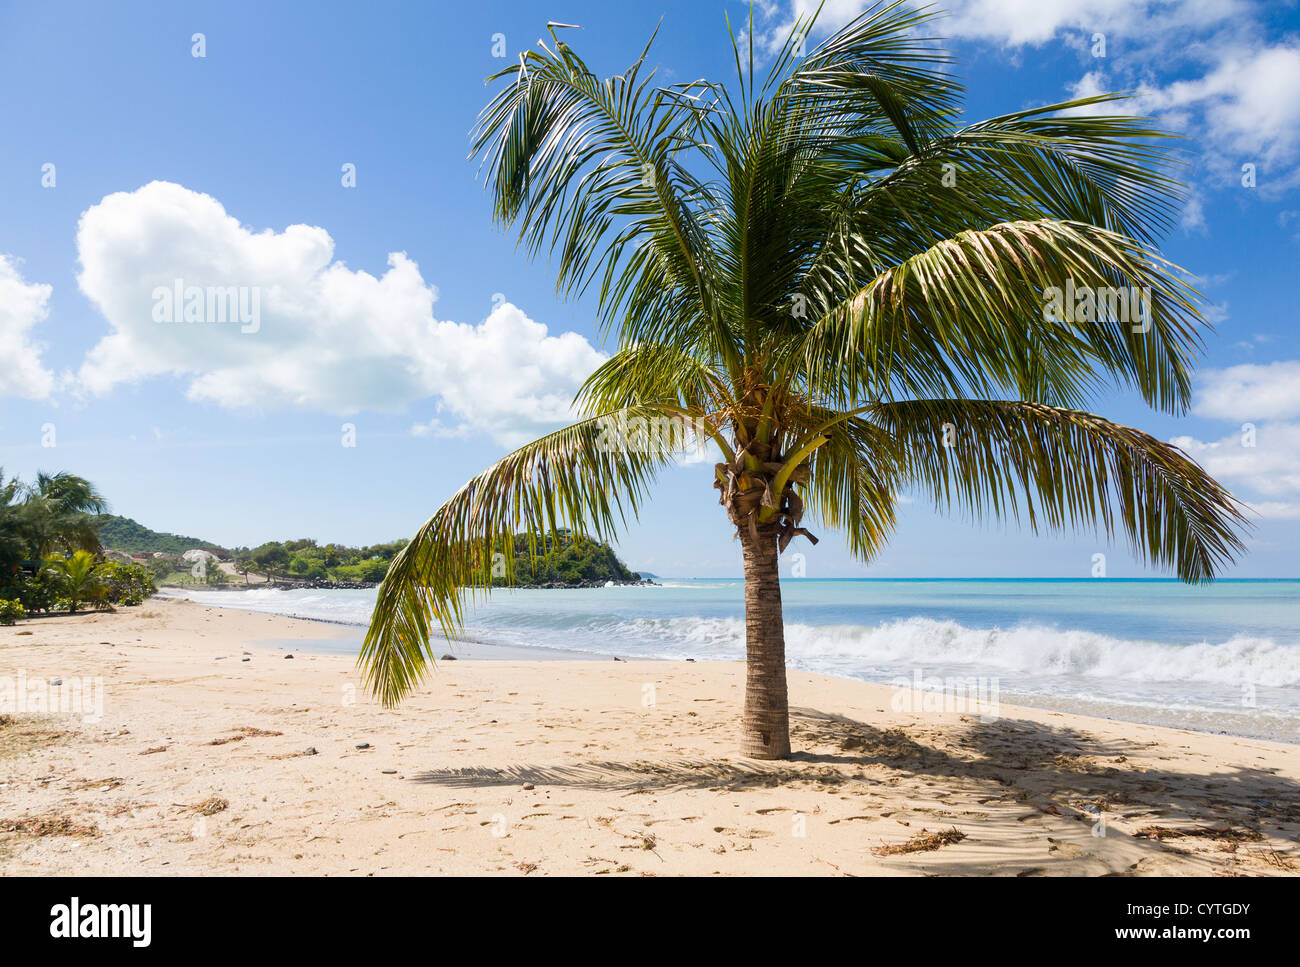 St Martin / Saint Maarten, isola dei Caraibi : promontorio off Friar's Bay con Palm tree Immagini Stock